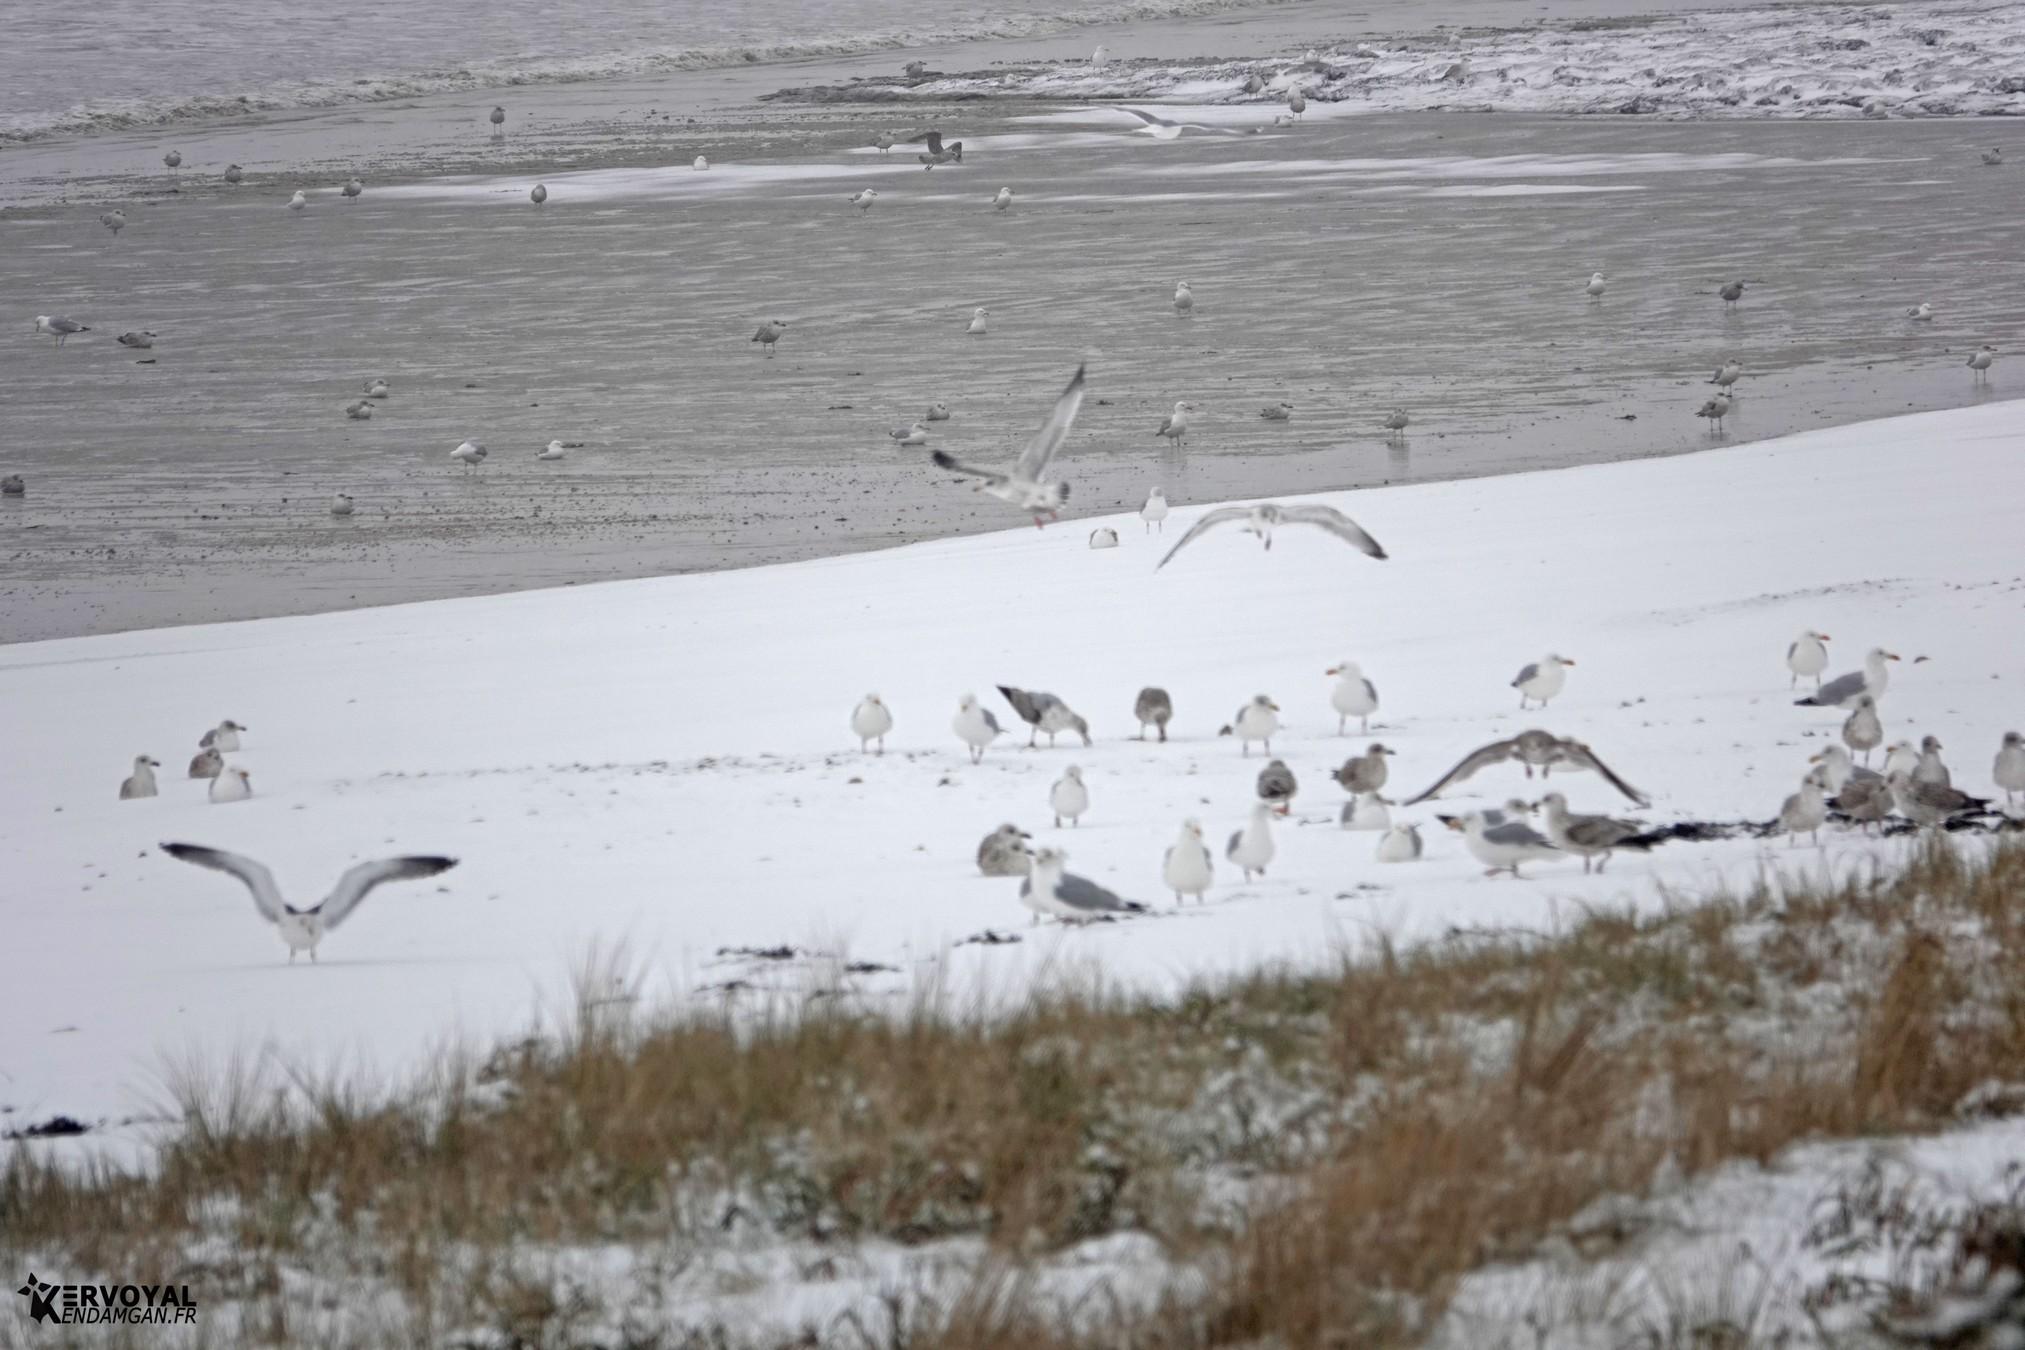 neige à kervoyal 11 février 2021 damgan morbihan (10)